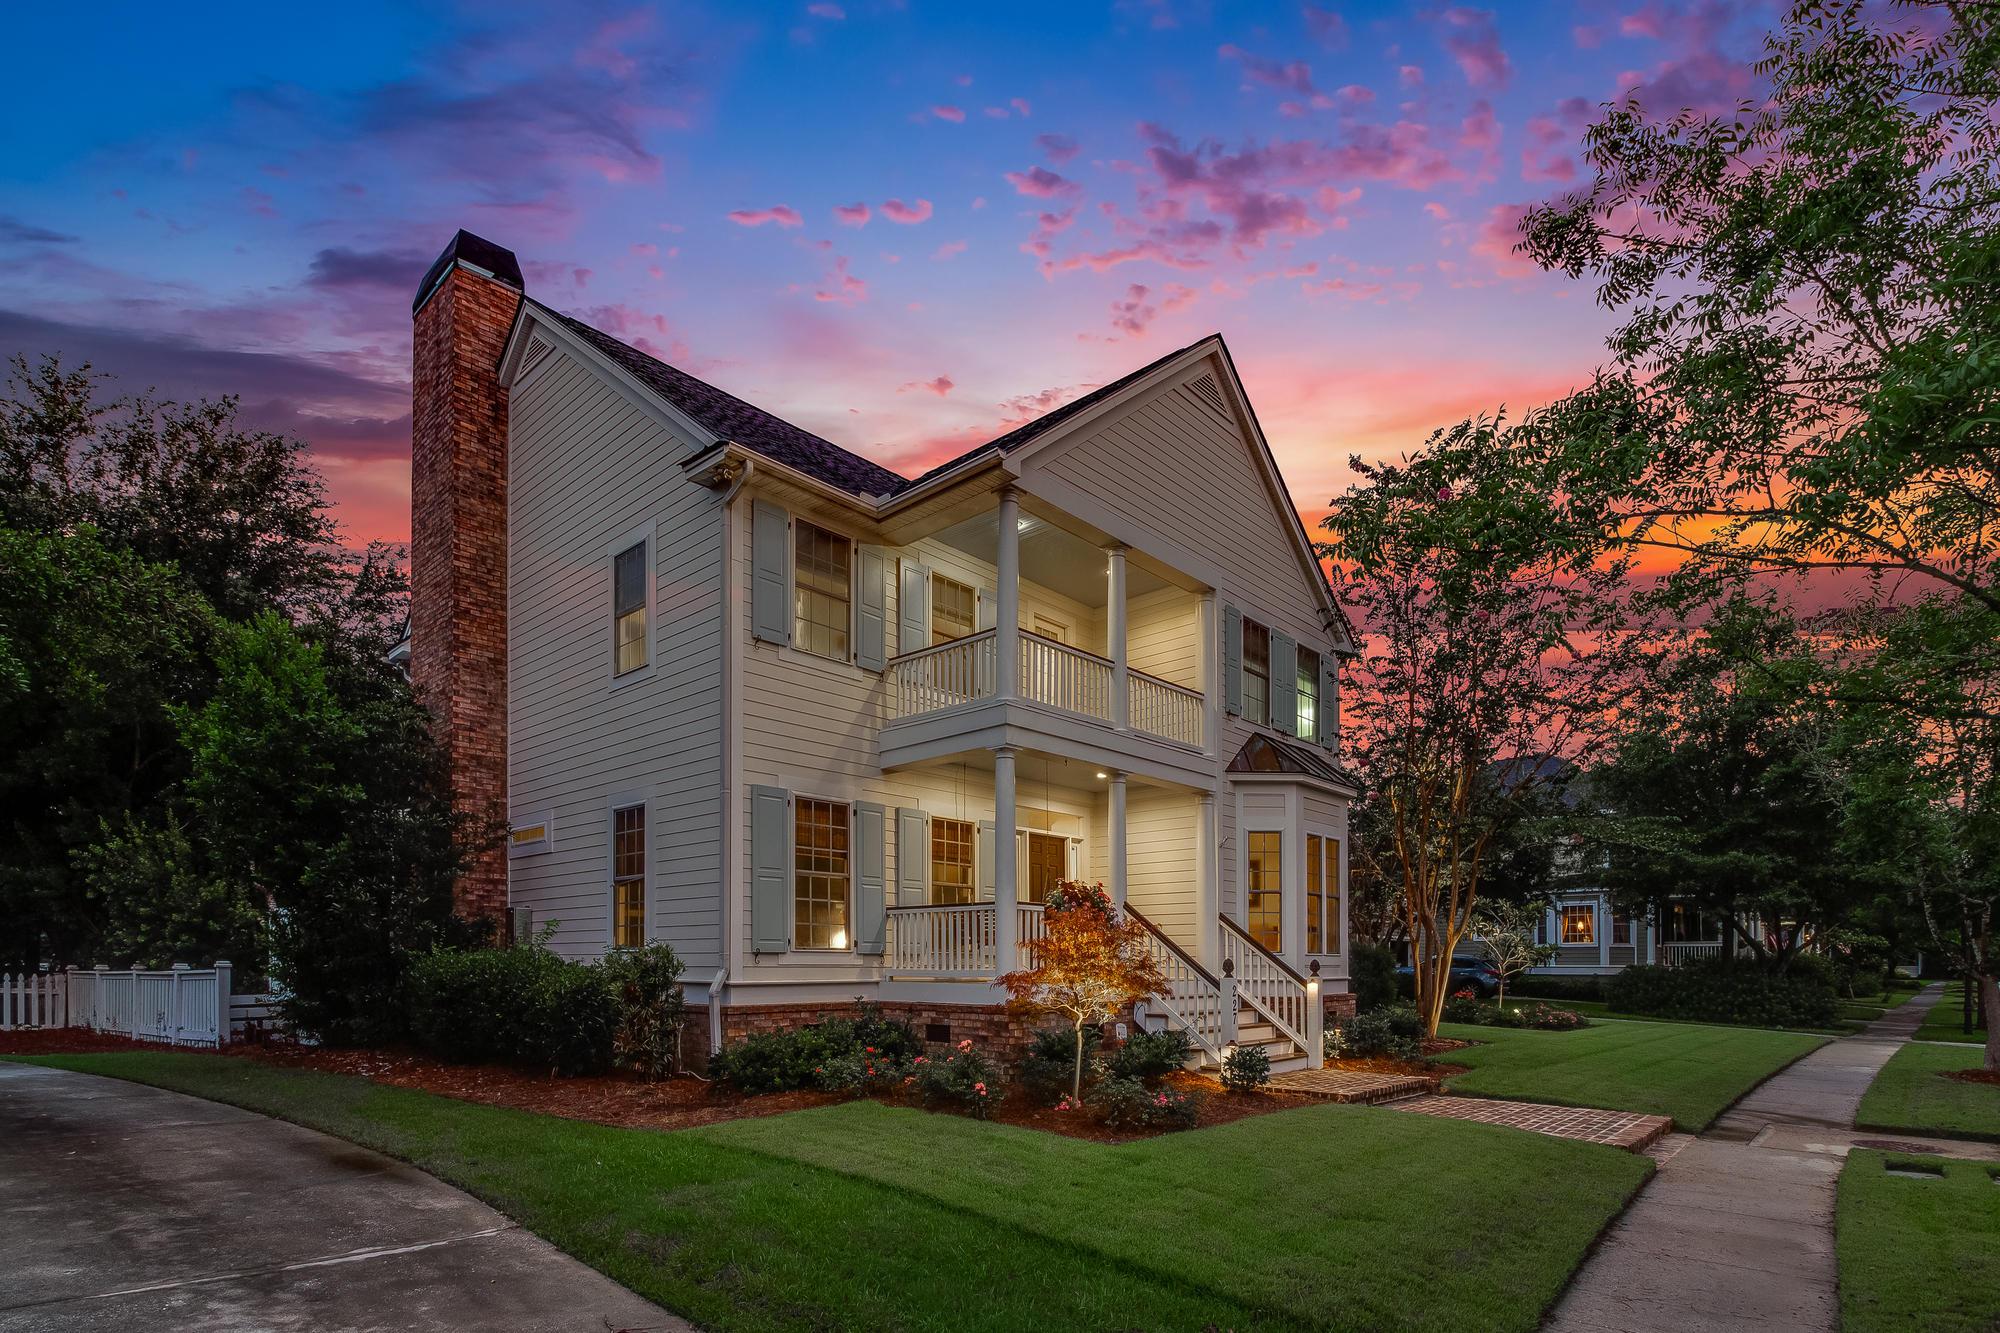 Codners Ferry Park Homes For Sale - 227 Fairchild, Daniel Island, SC - 1